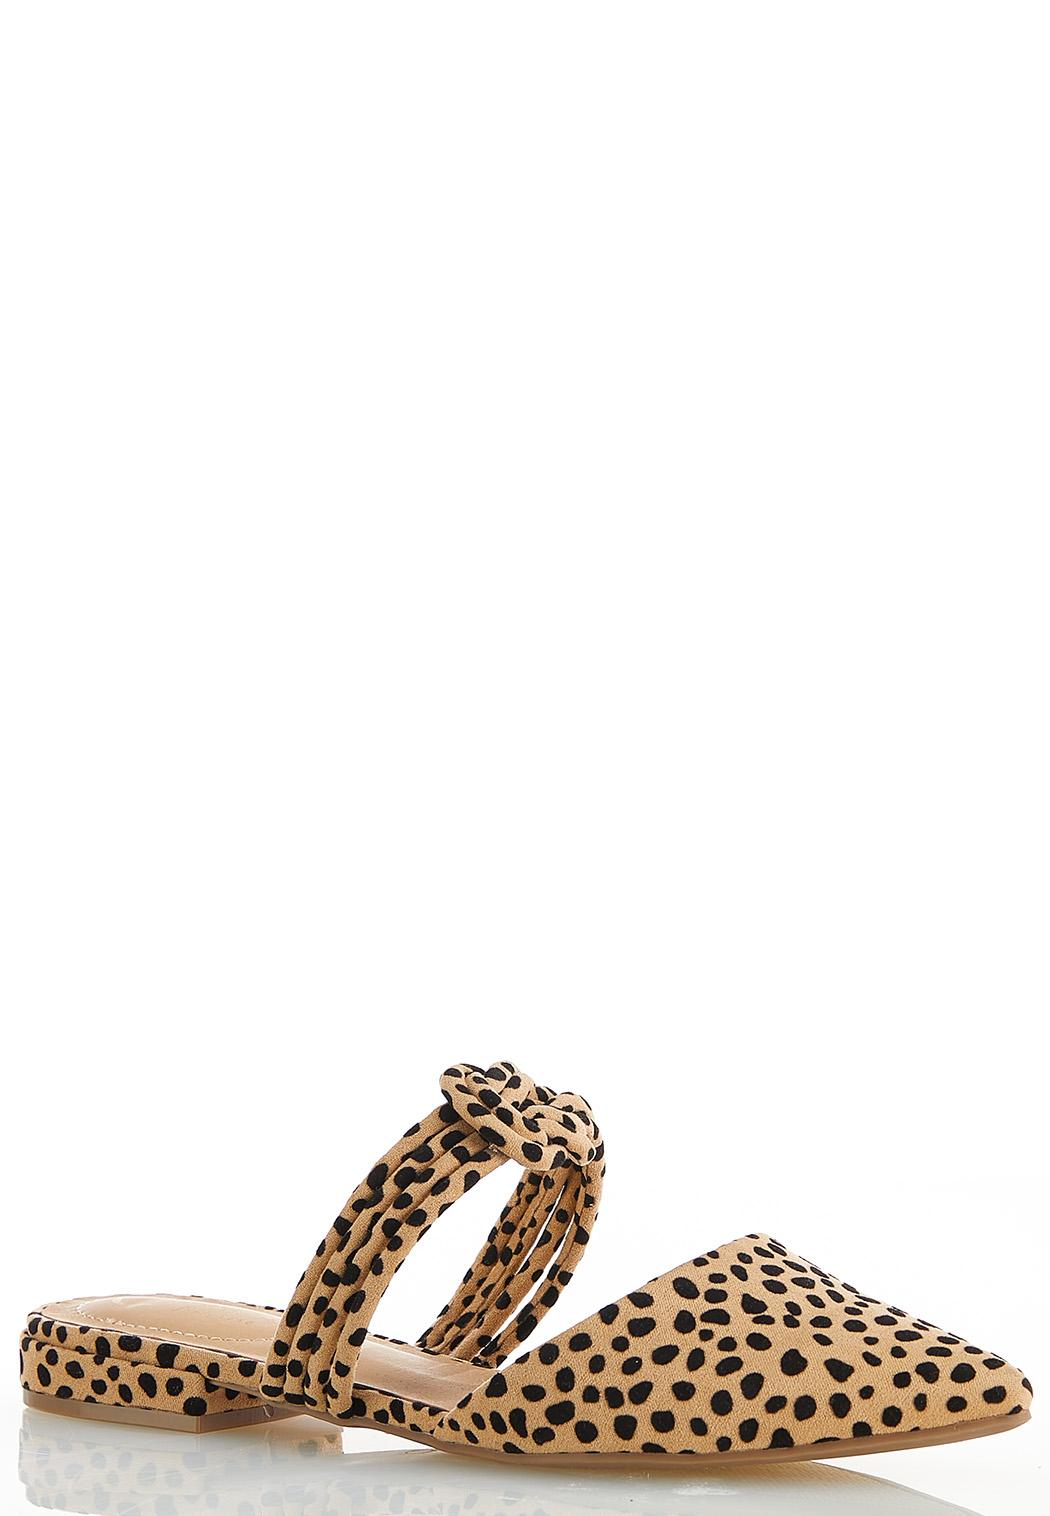 Cheetah Suede Mules